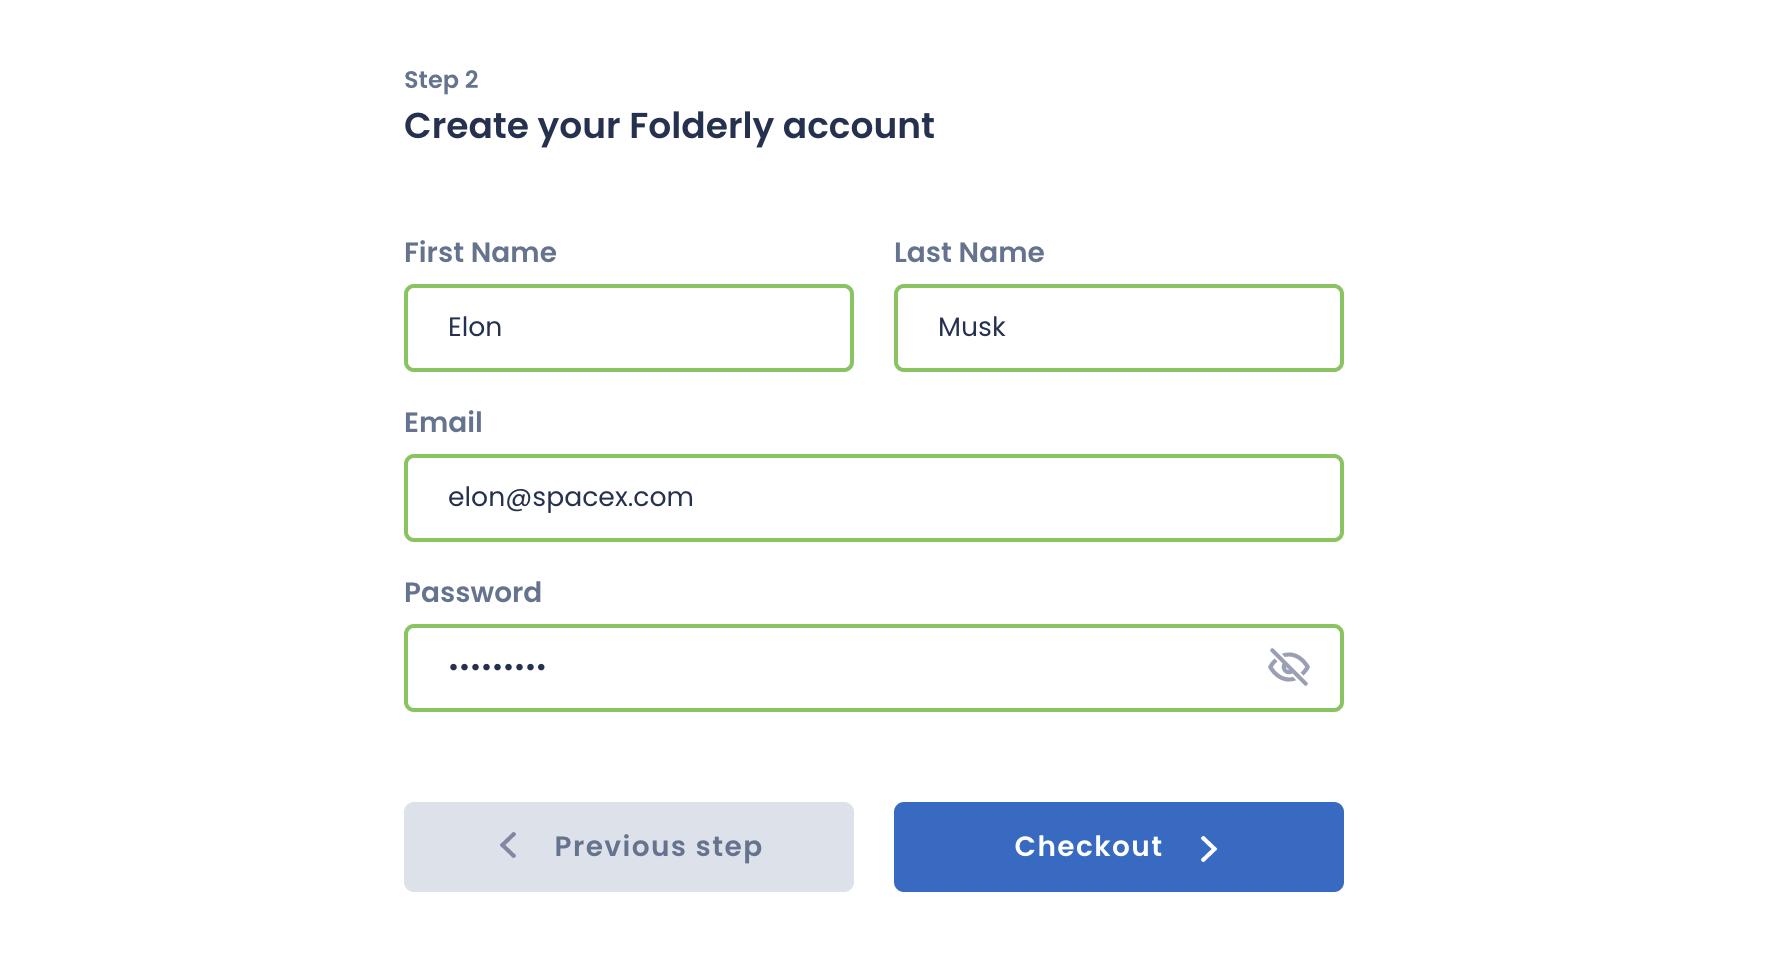 Folderly account creation